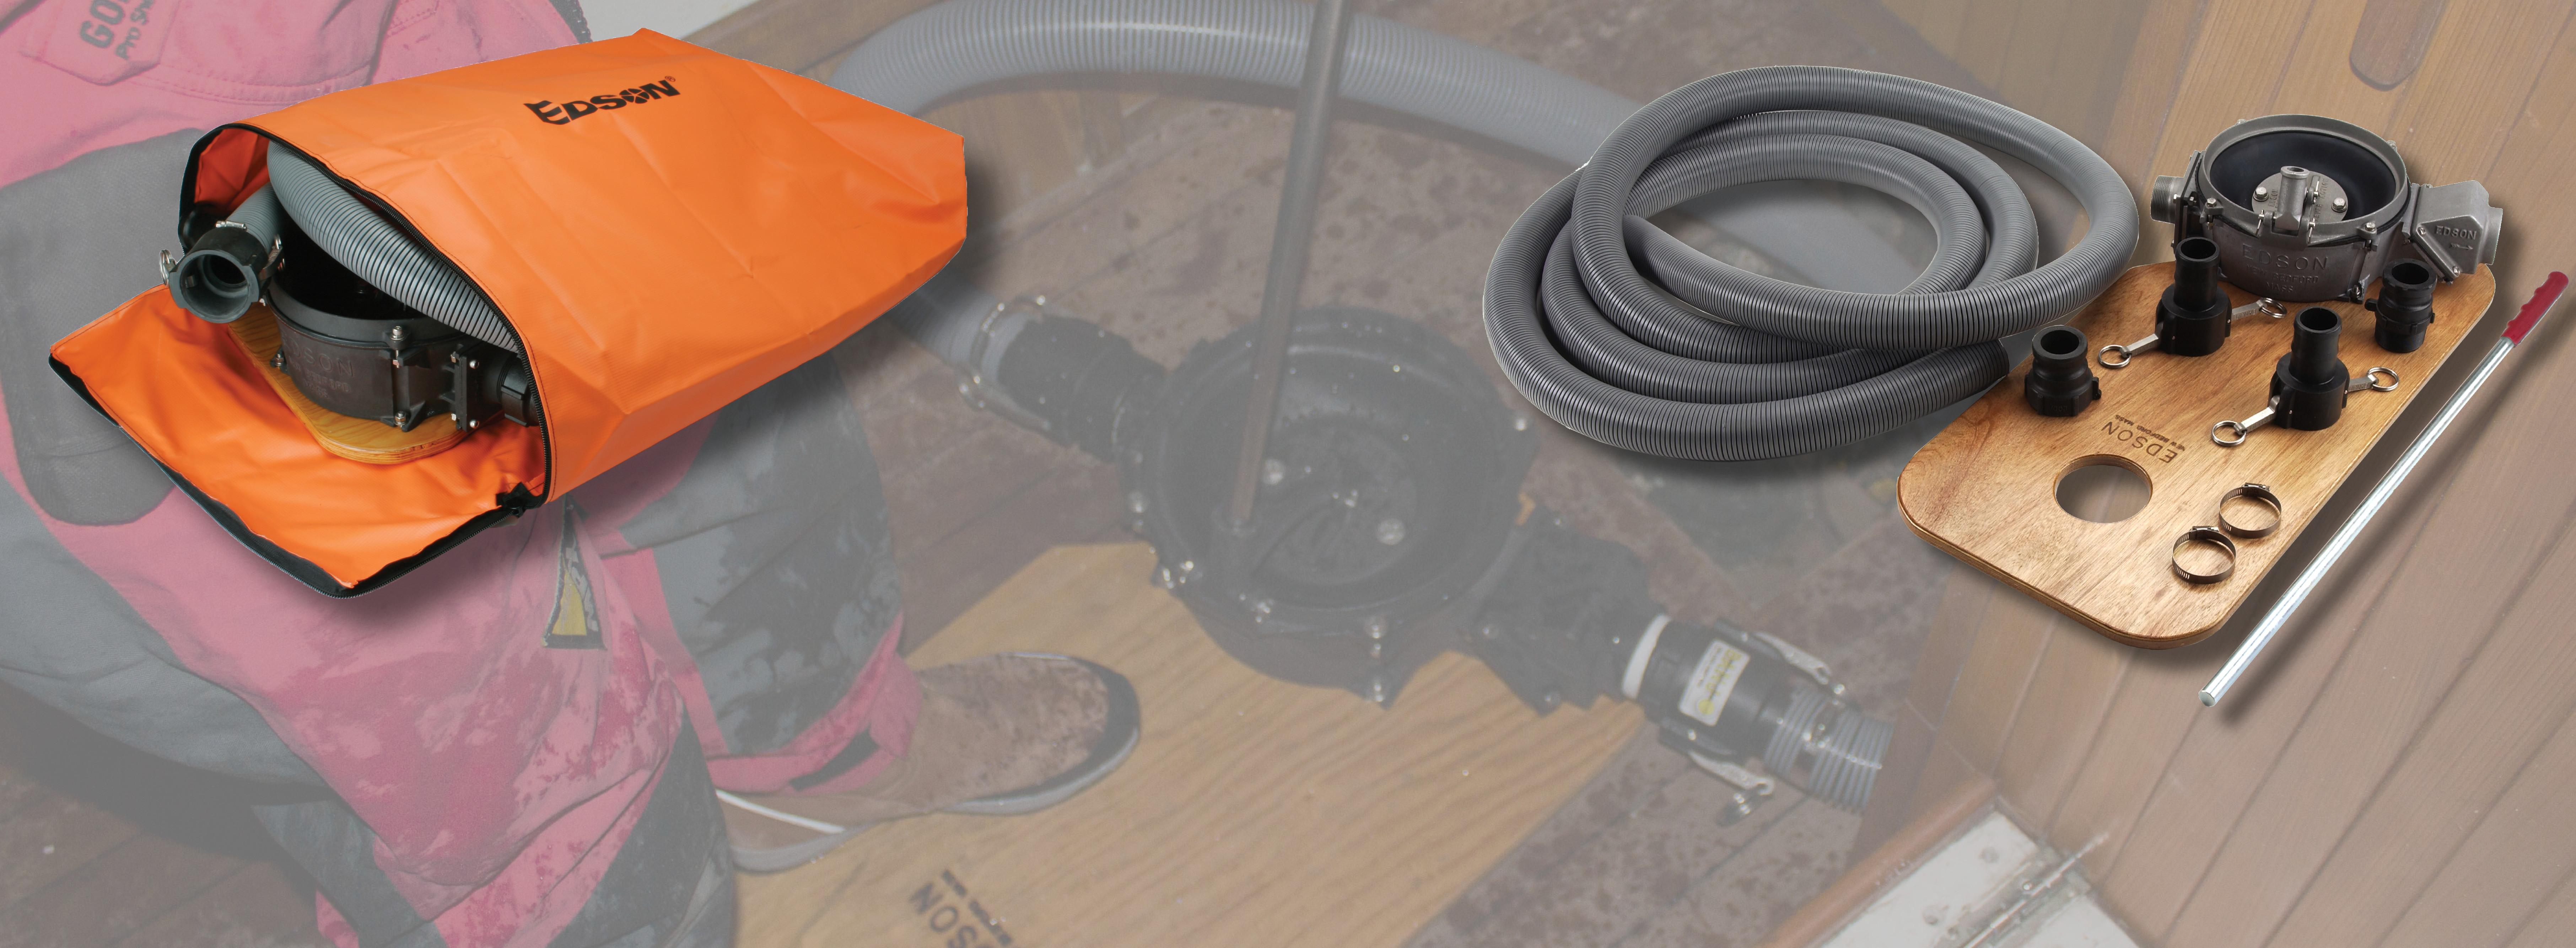 portable-pump-kit-page-banner-small.jpg